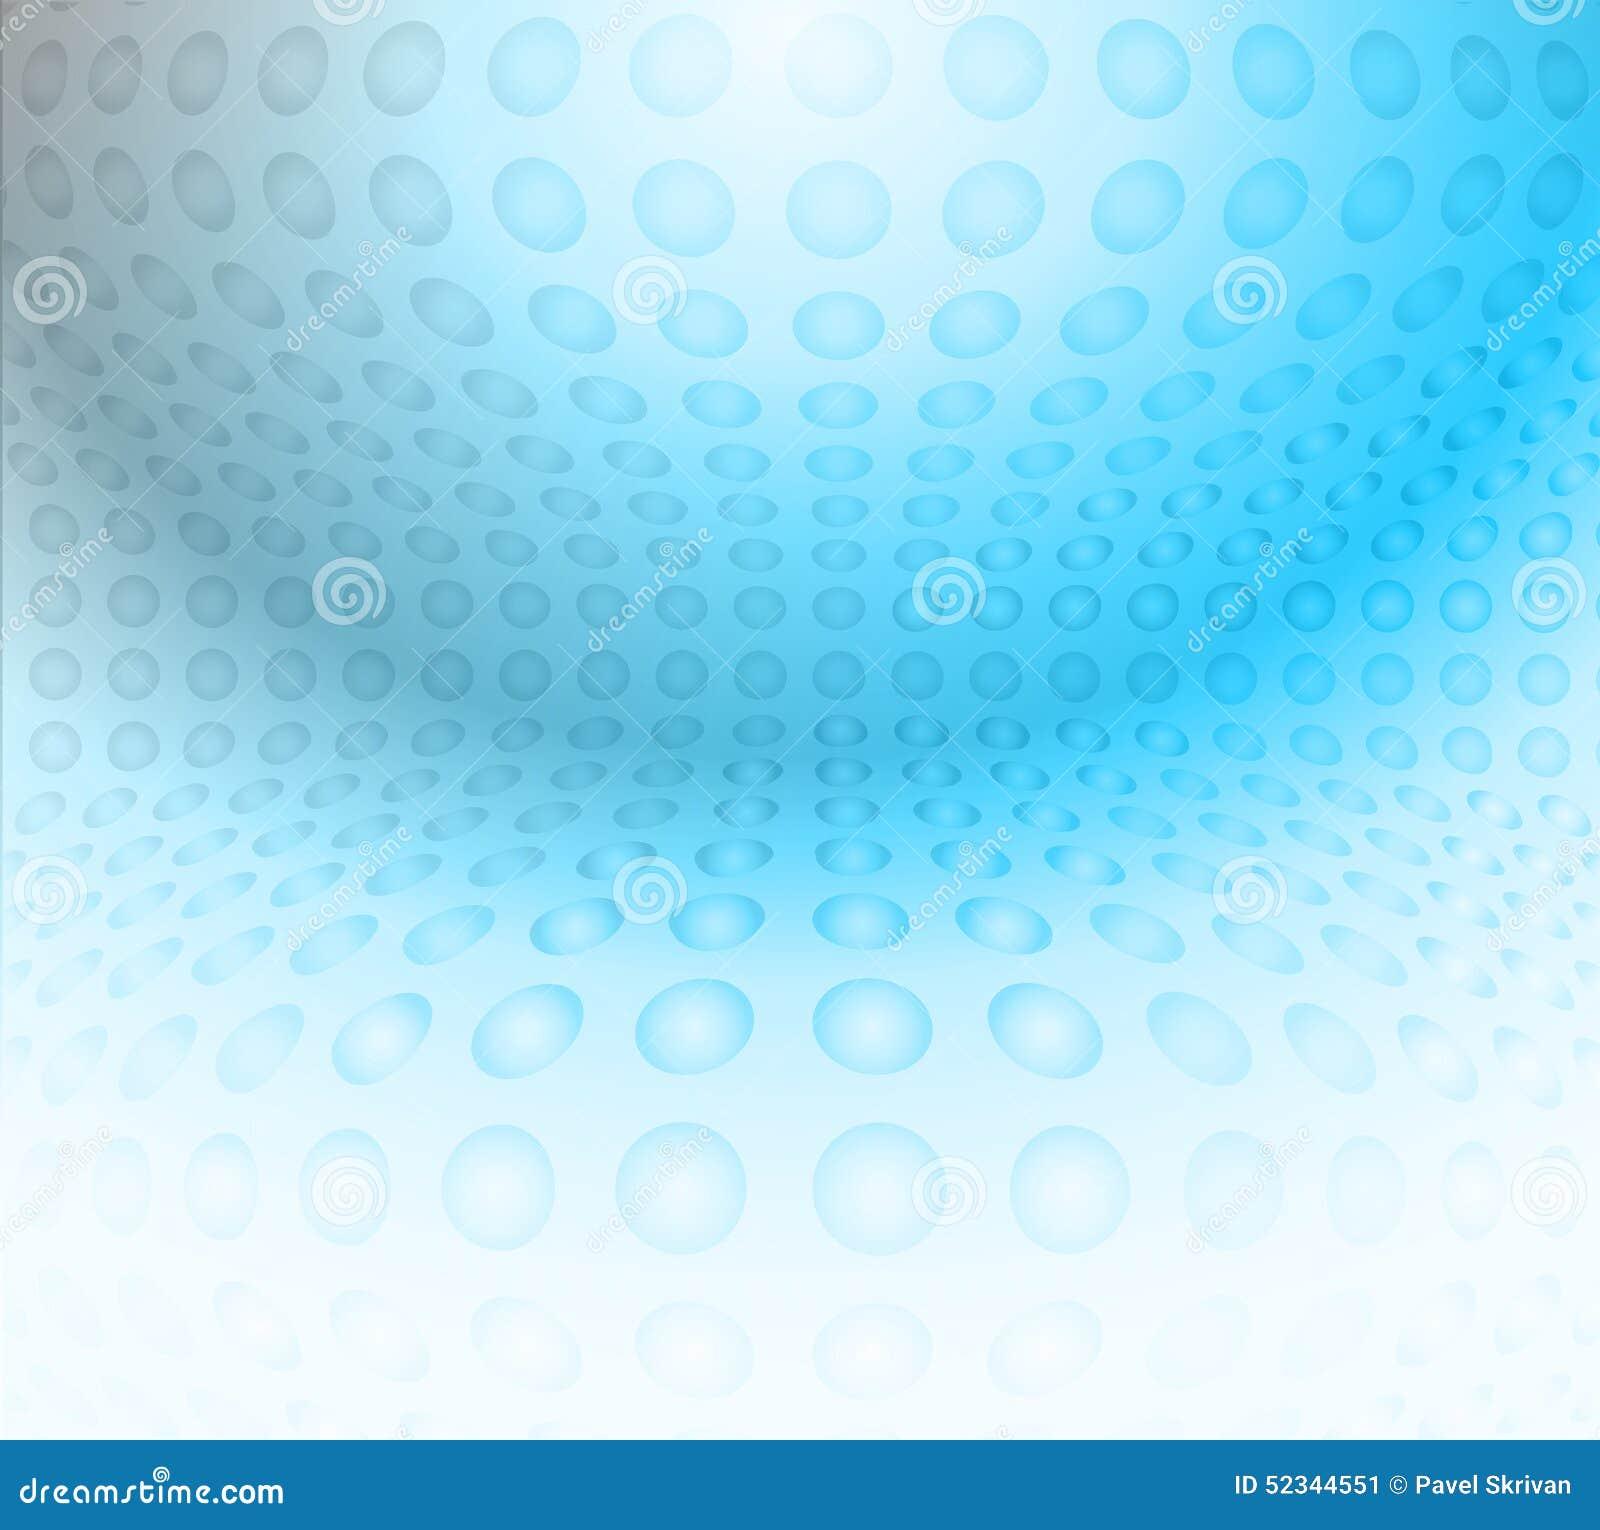 illustration web page background stock illustration illustration